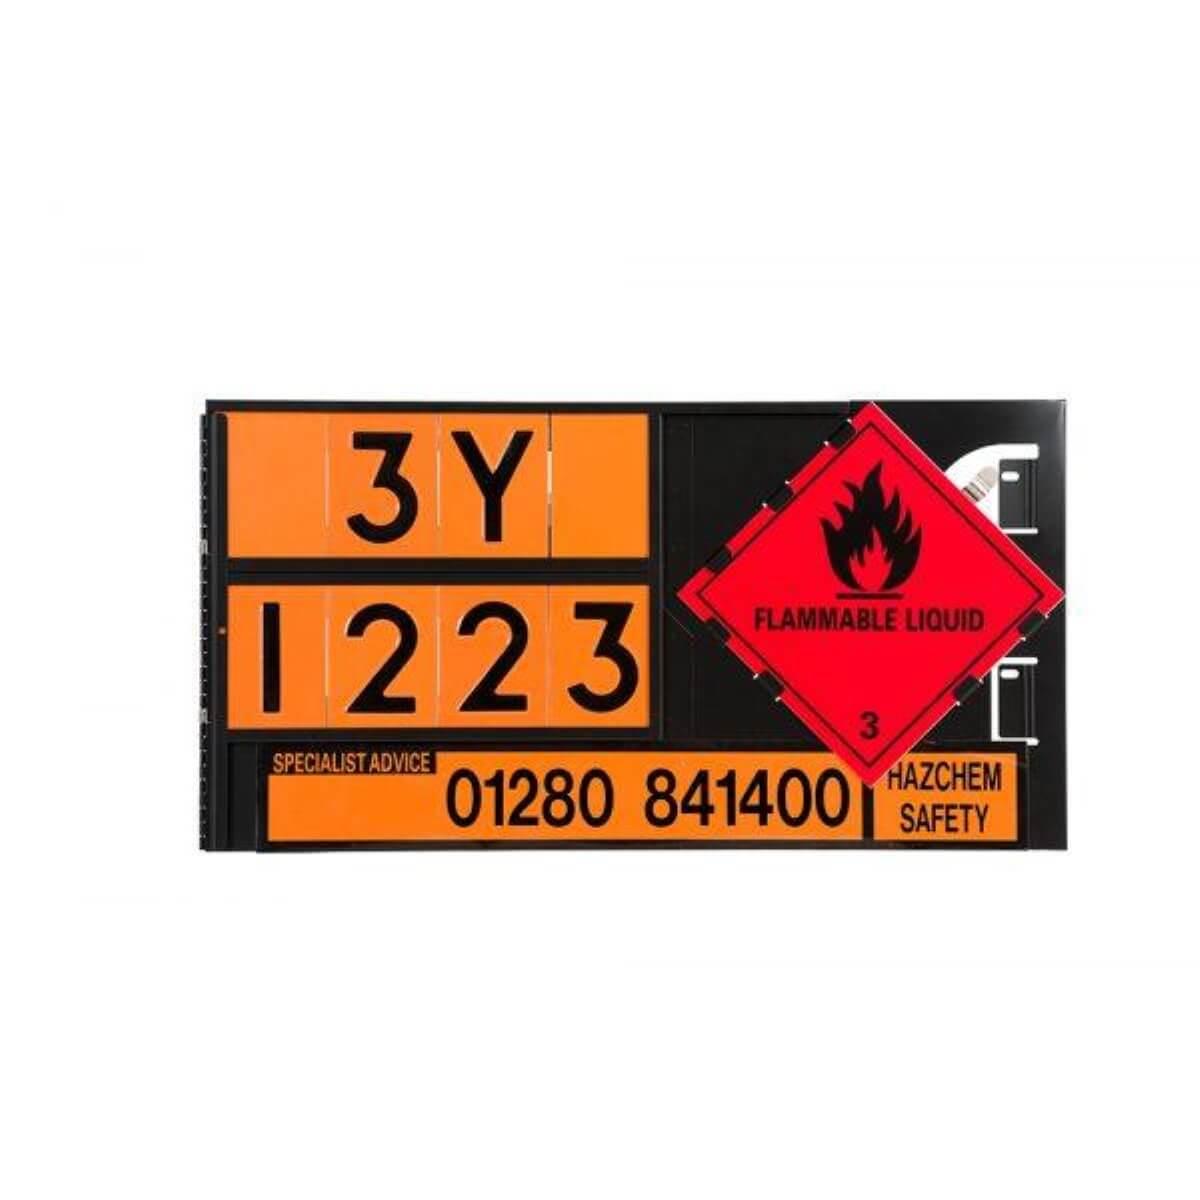 VS2263-With Digits Hazchem Triplex ADR Panel Holder 700x400mm